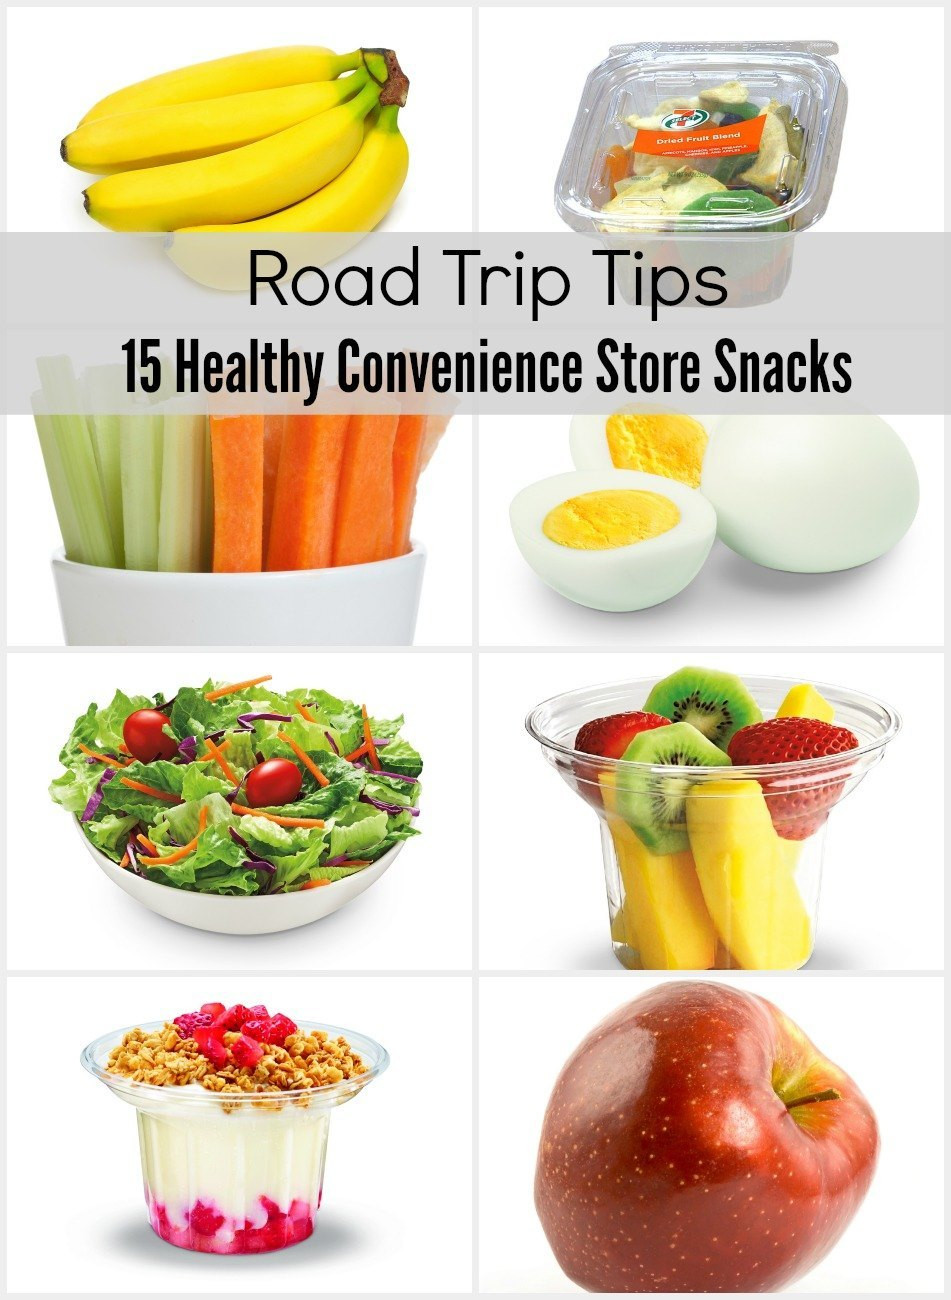 Best Road Trip Snacks Healthy  15 Healthy Convenience Store Snacks for a Road Trip La